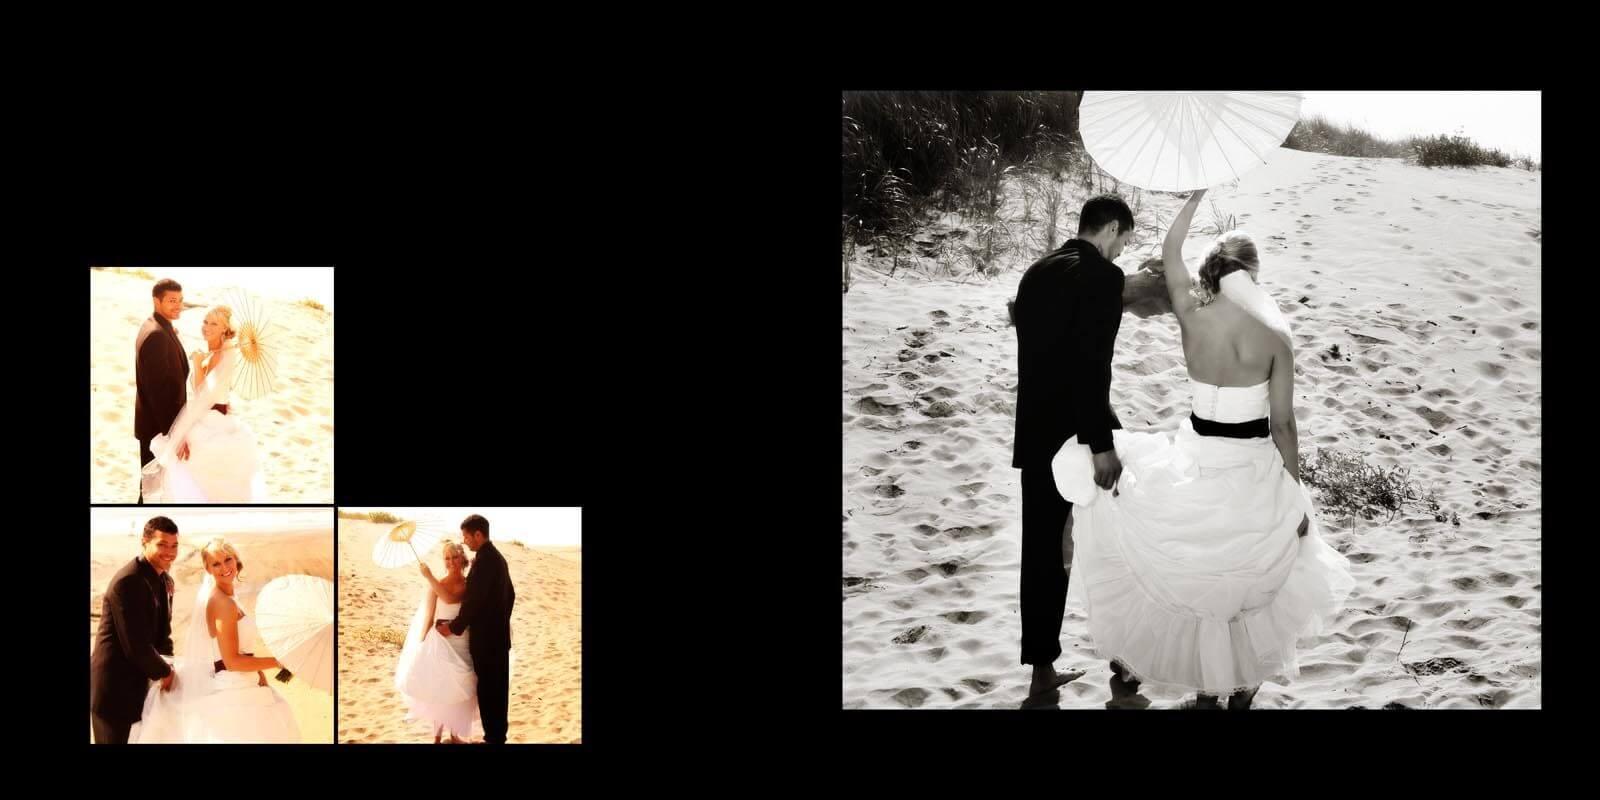 gearheart-cannon-beach-mcmenamins-oregon-coast-wedding-014-015-1.jpg